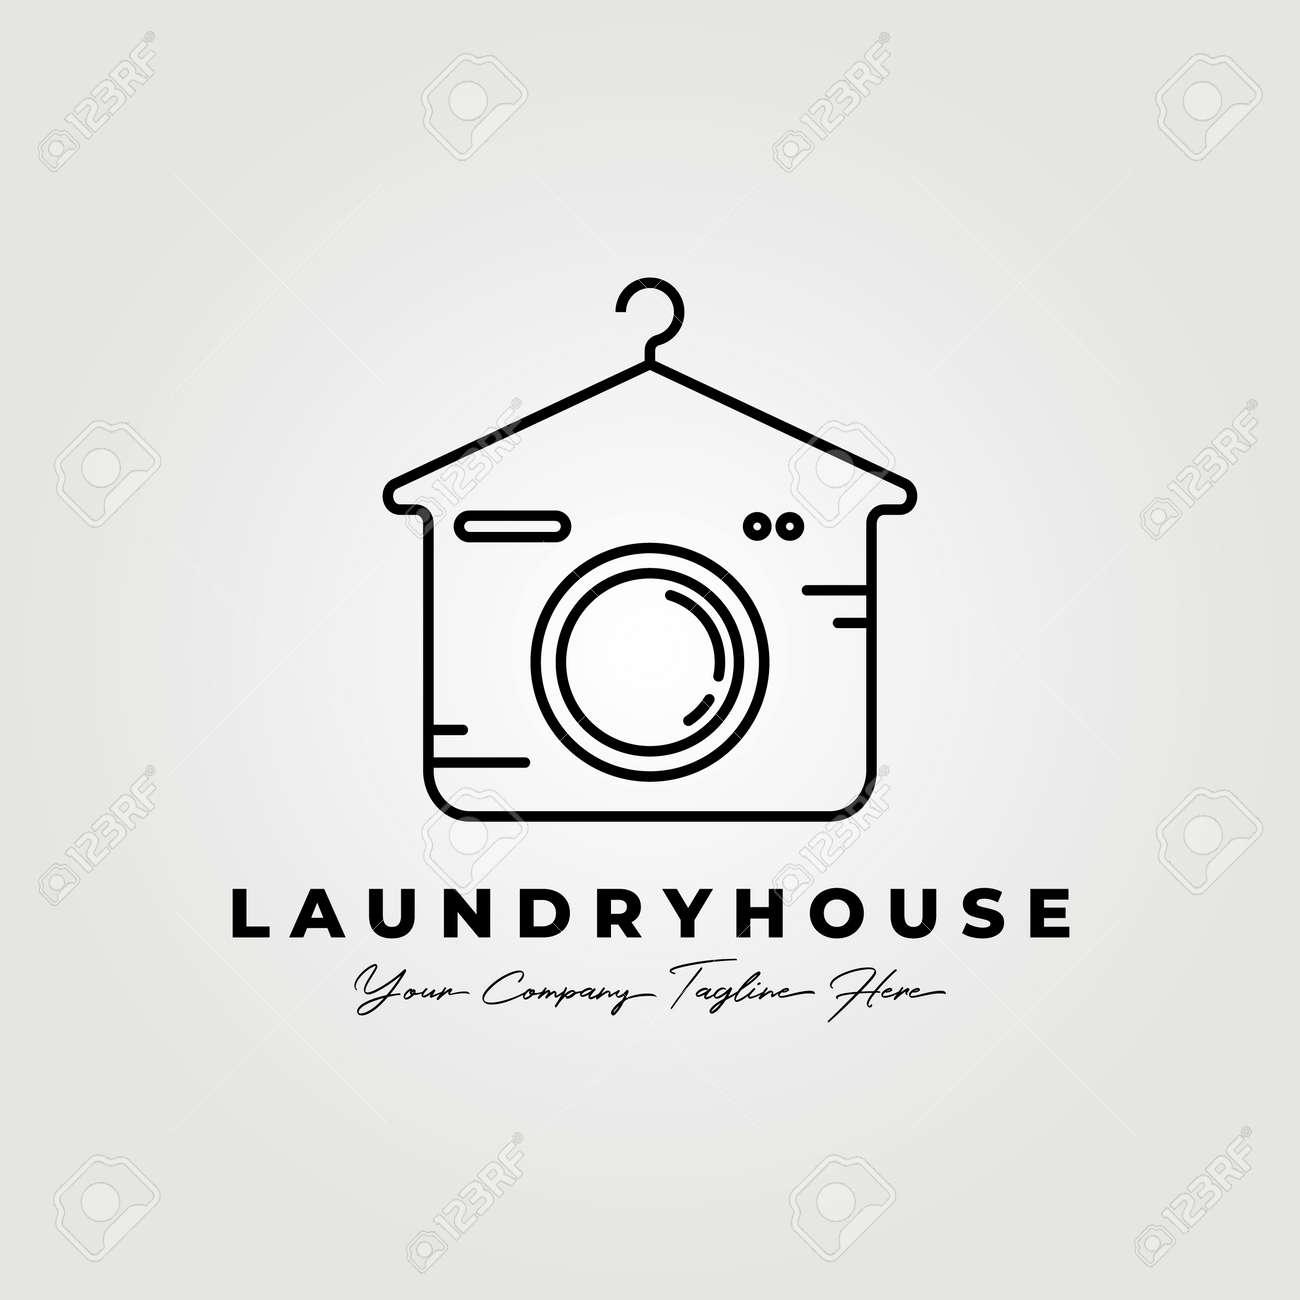 Laundry house line art logo vector illustration design graphic - 167132002